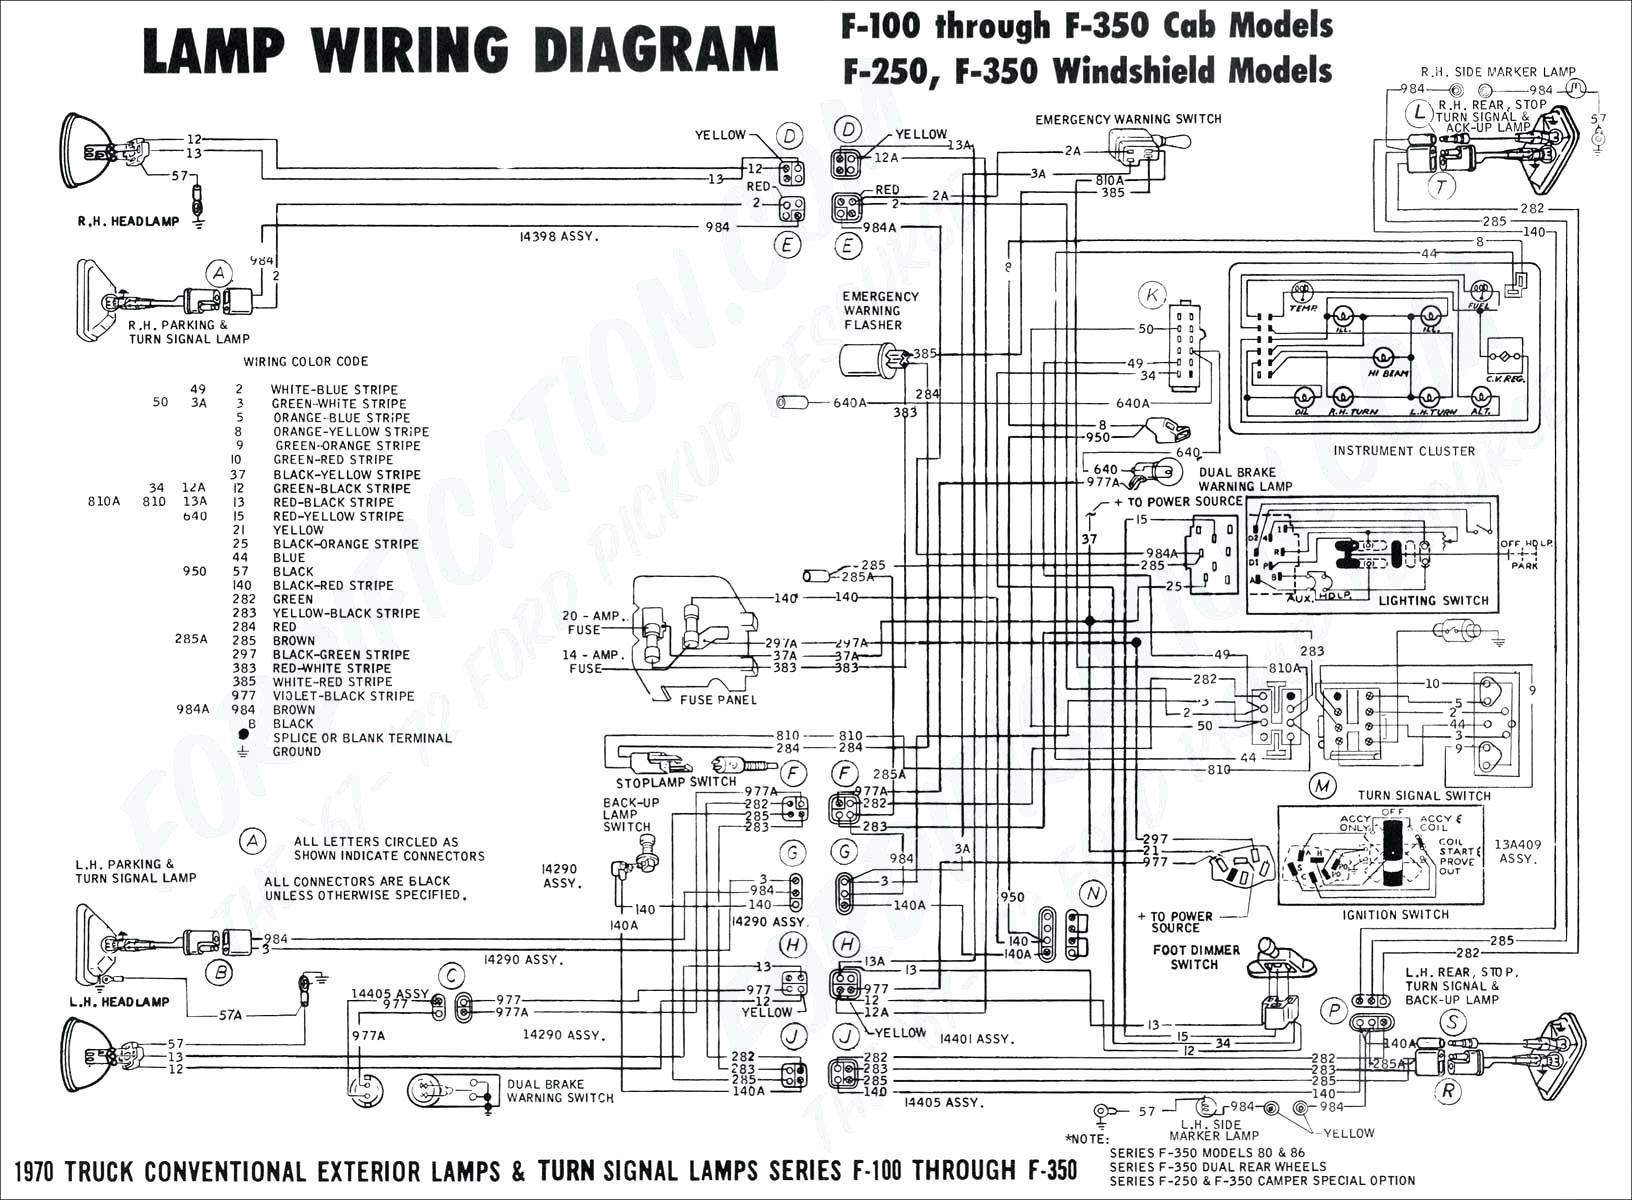 Green Engine Working Diagram Mercial Trailer Wiring Diagram Download Of Green Engine Working Diagram